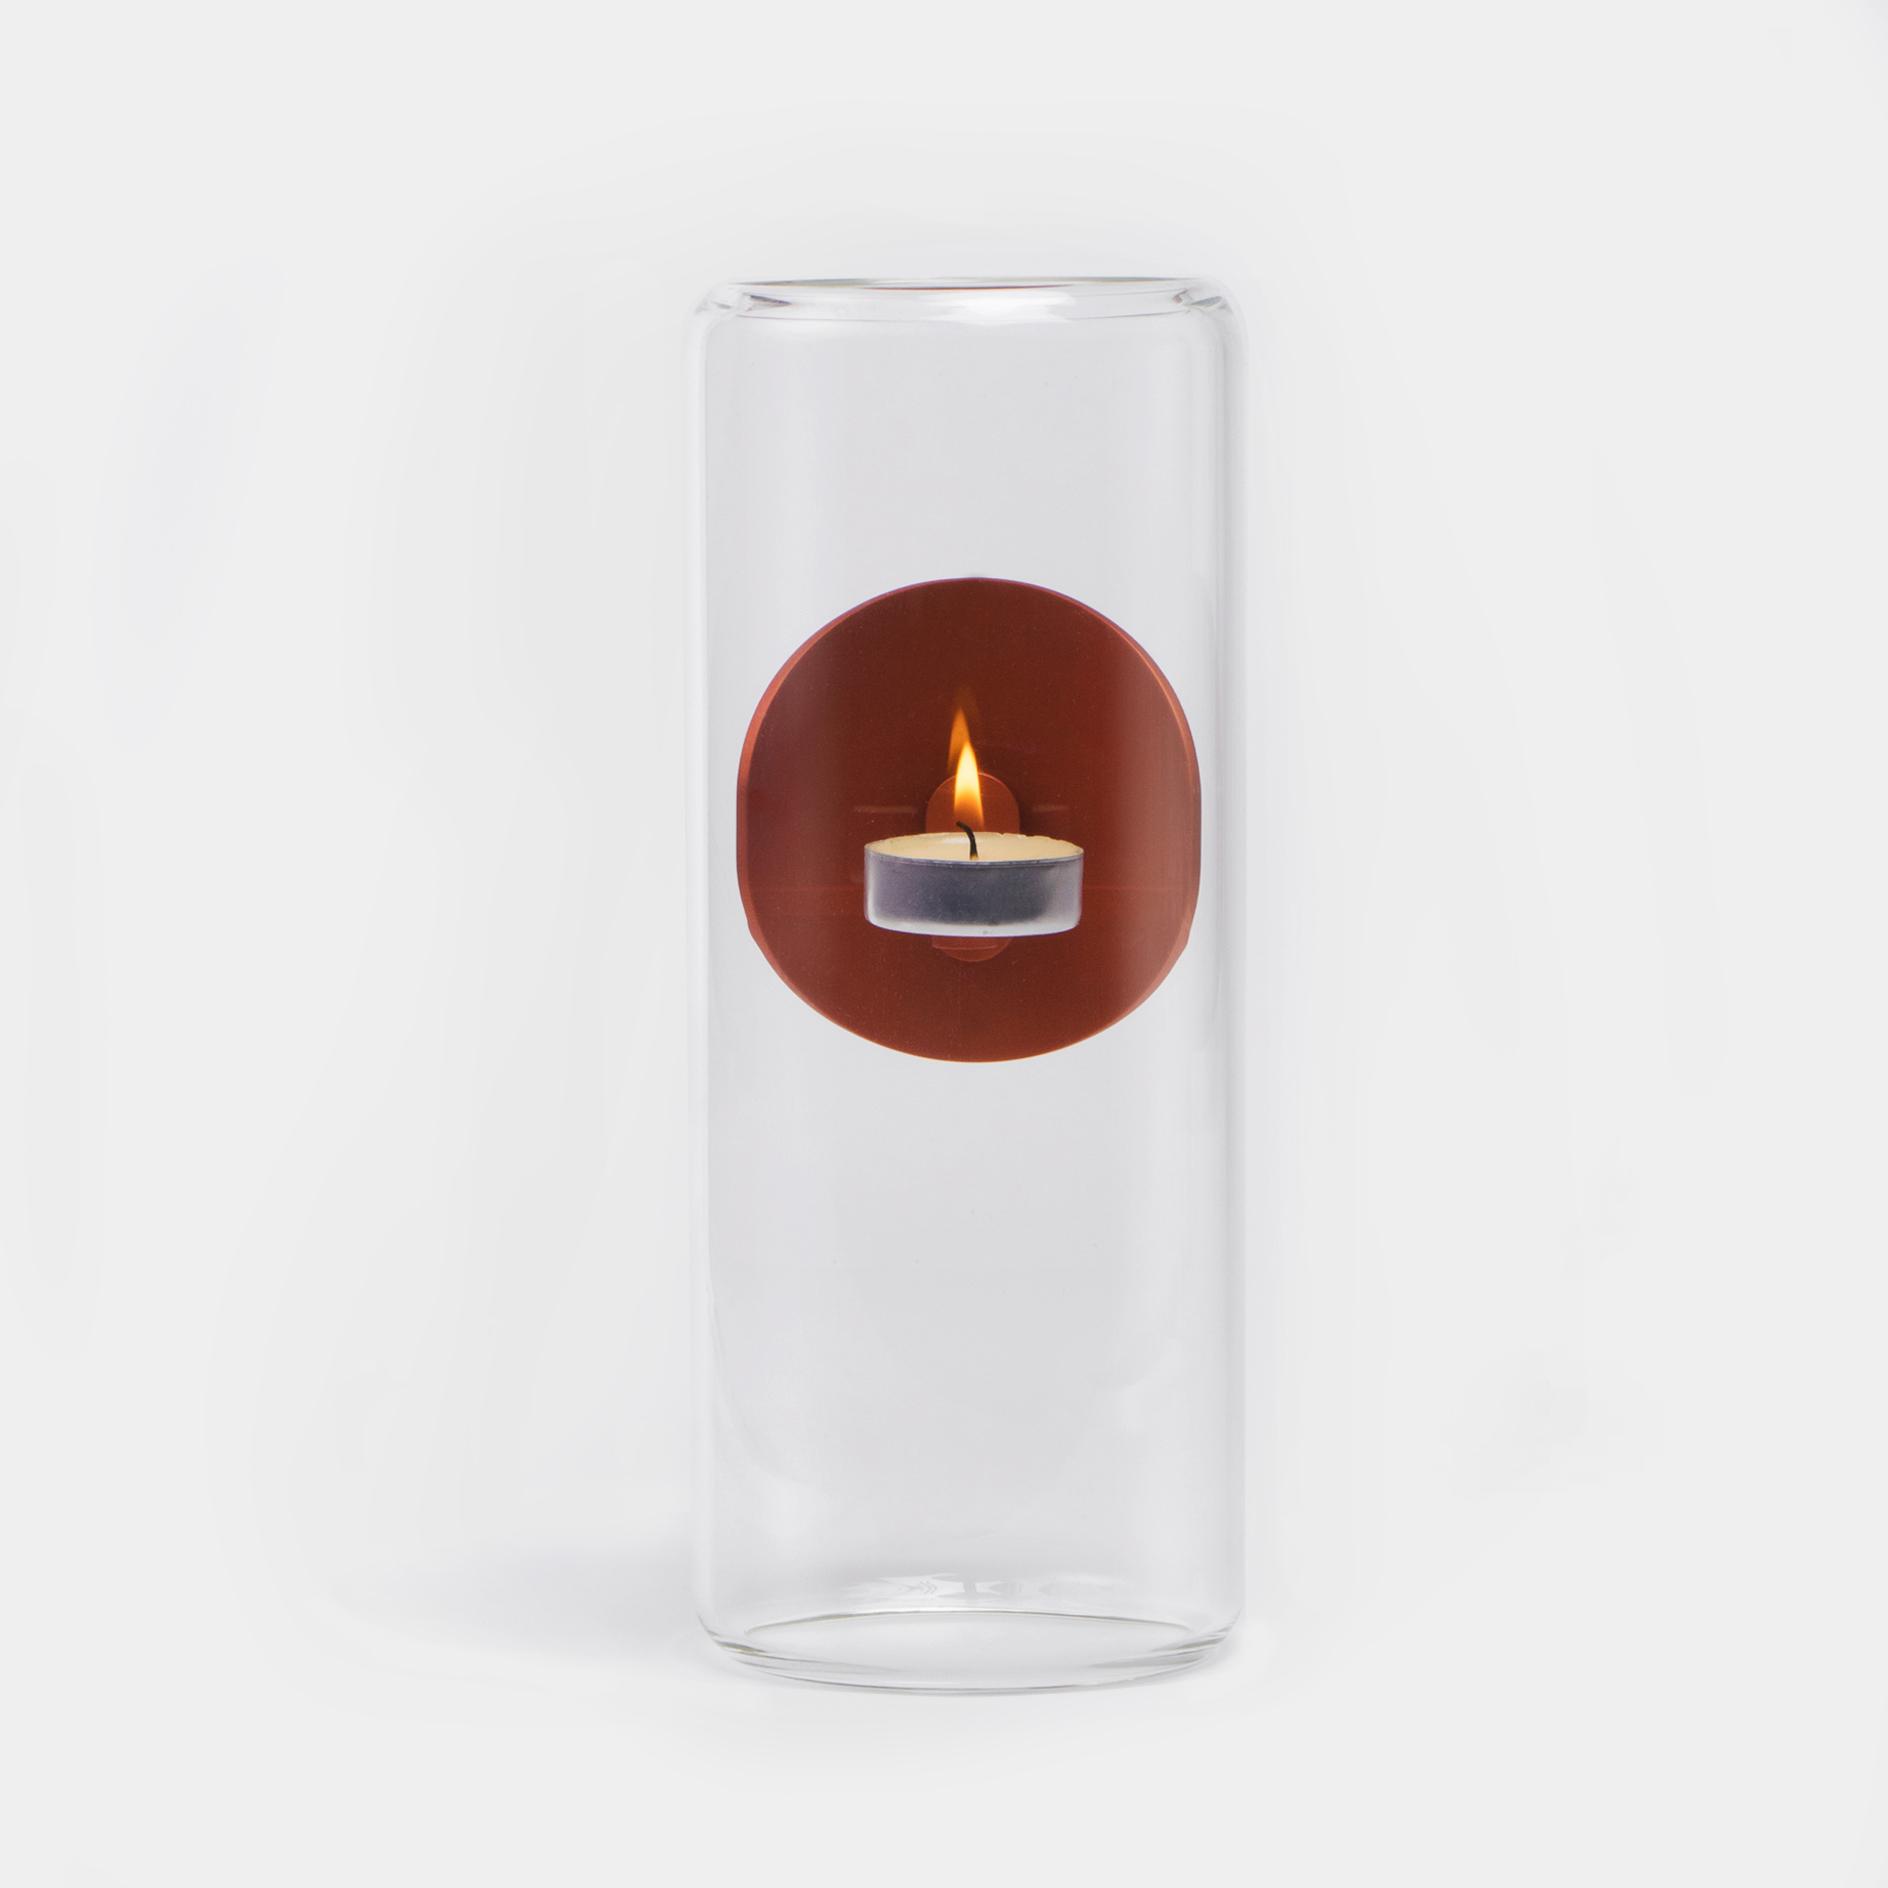 Dot Candle holder